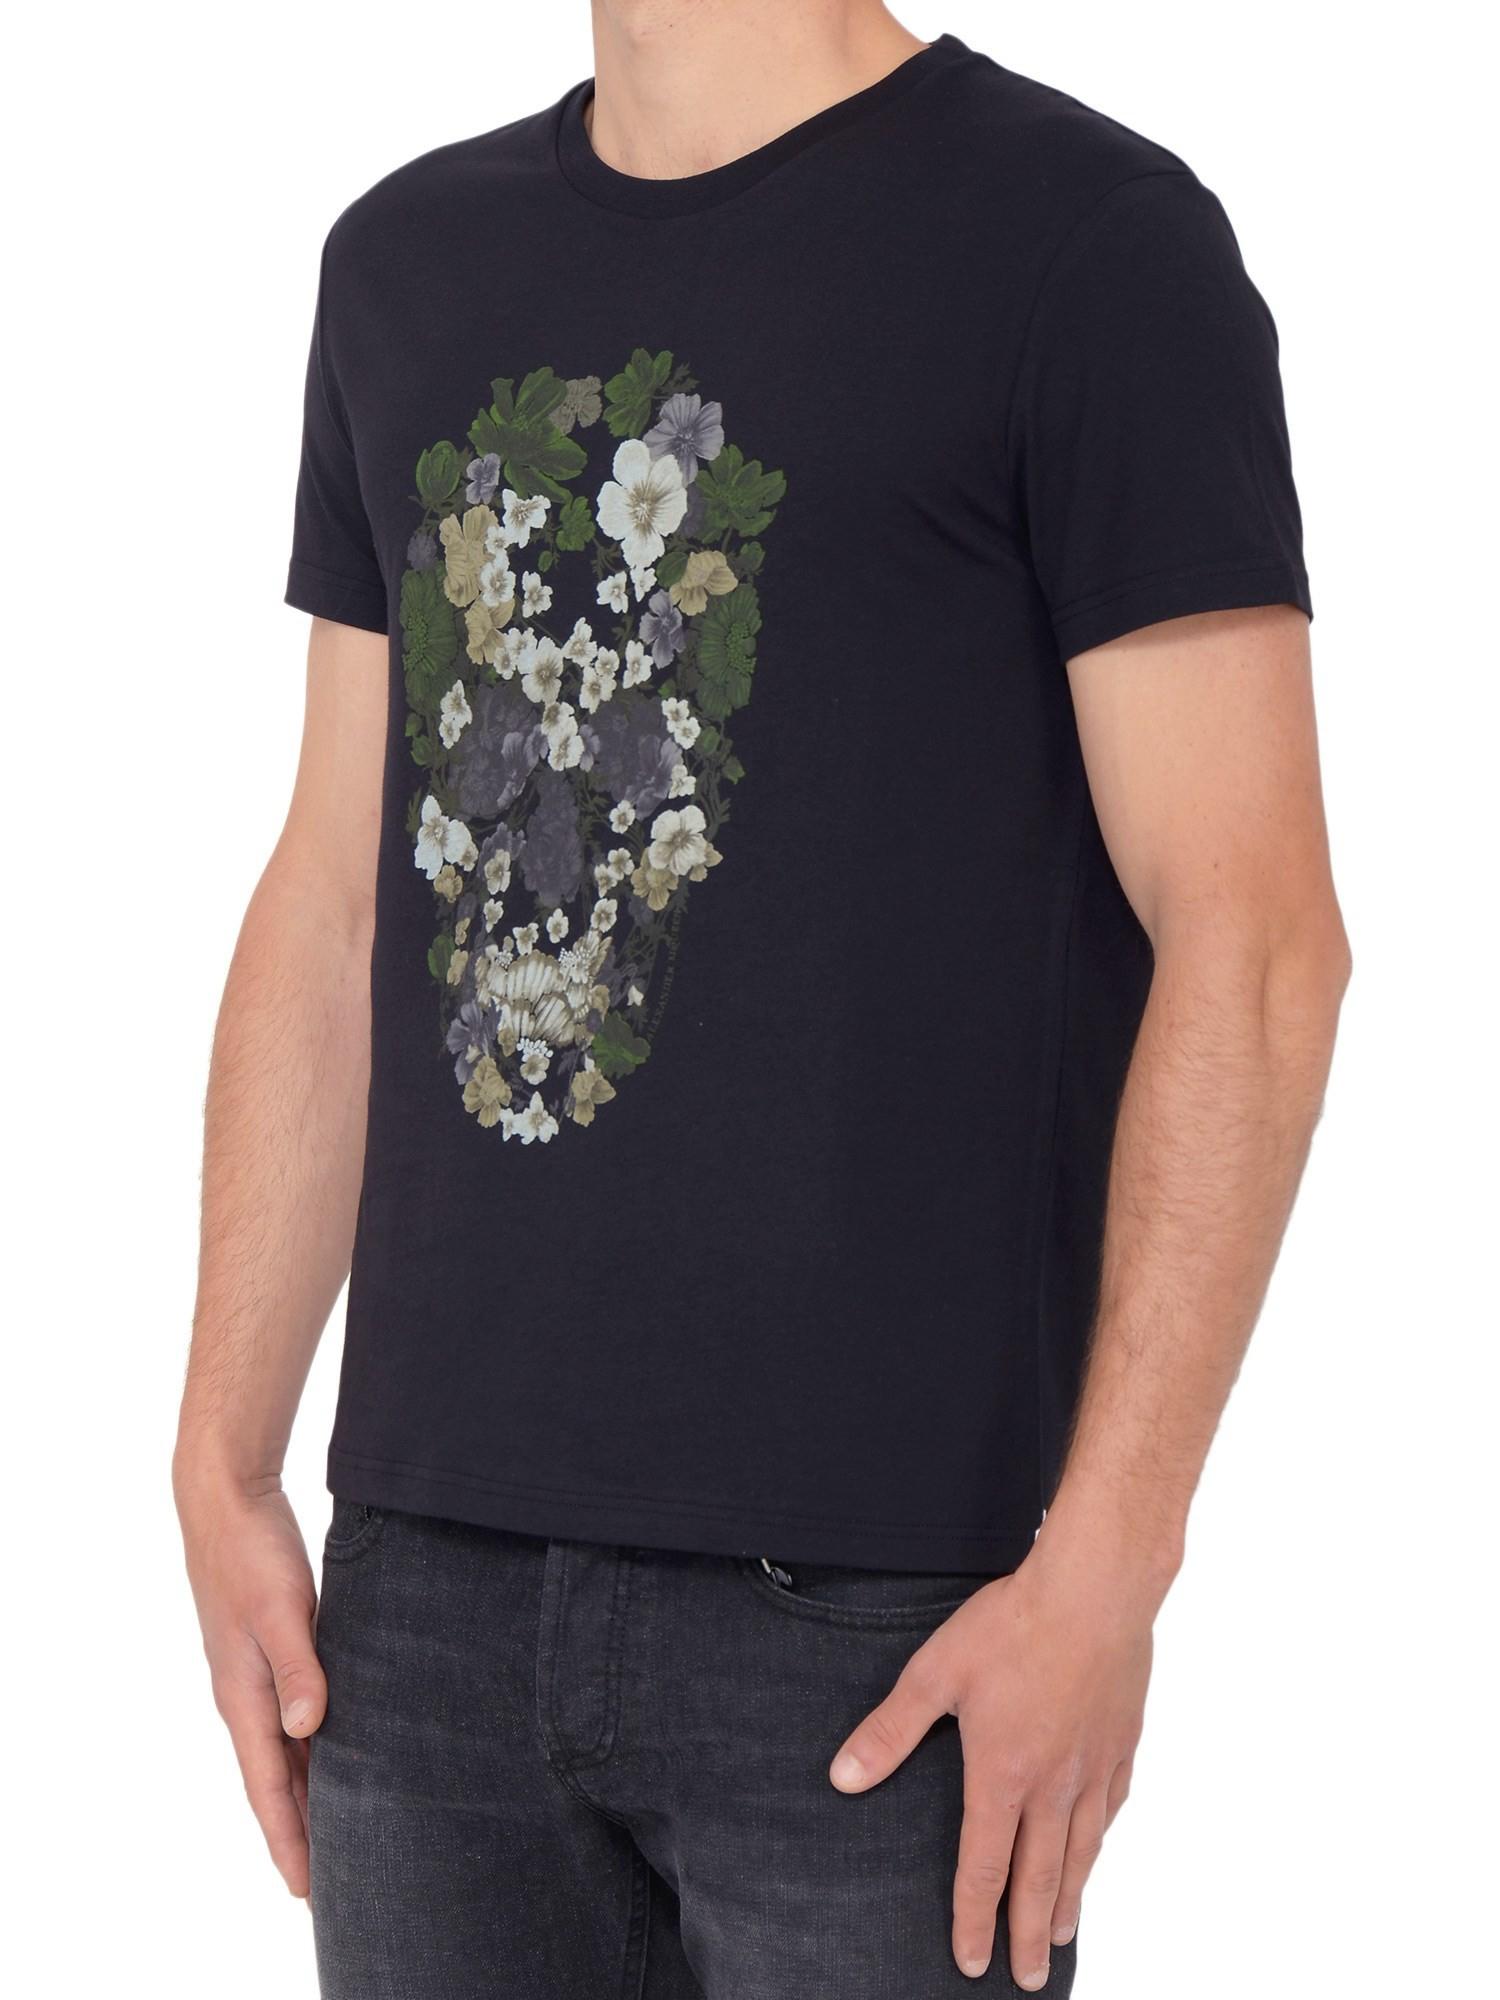 Alexander mcqueen skull print t shirt in black for men for Alexander mcqueen shirt men